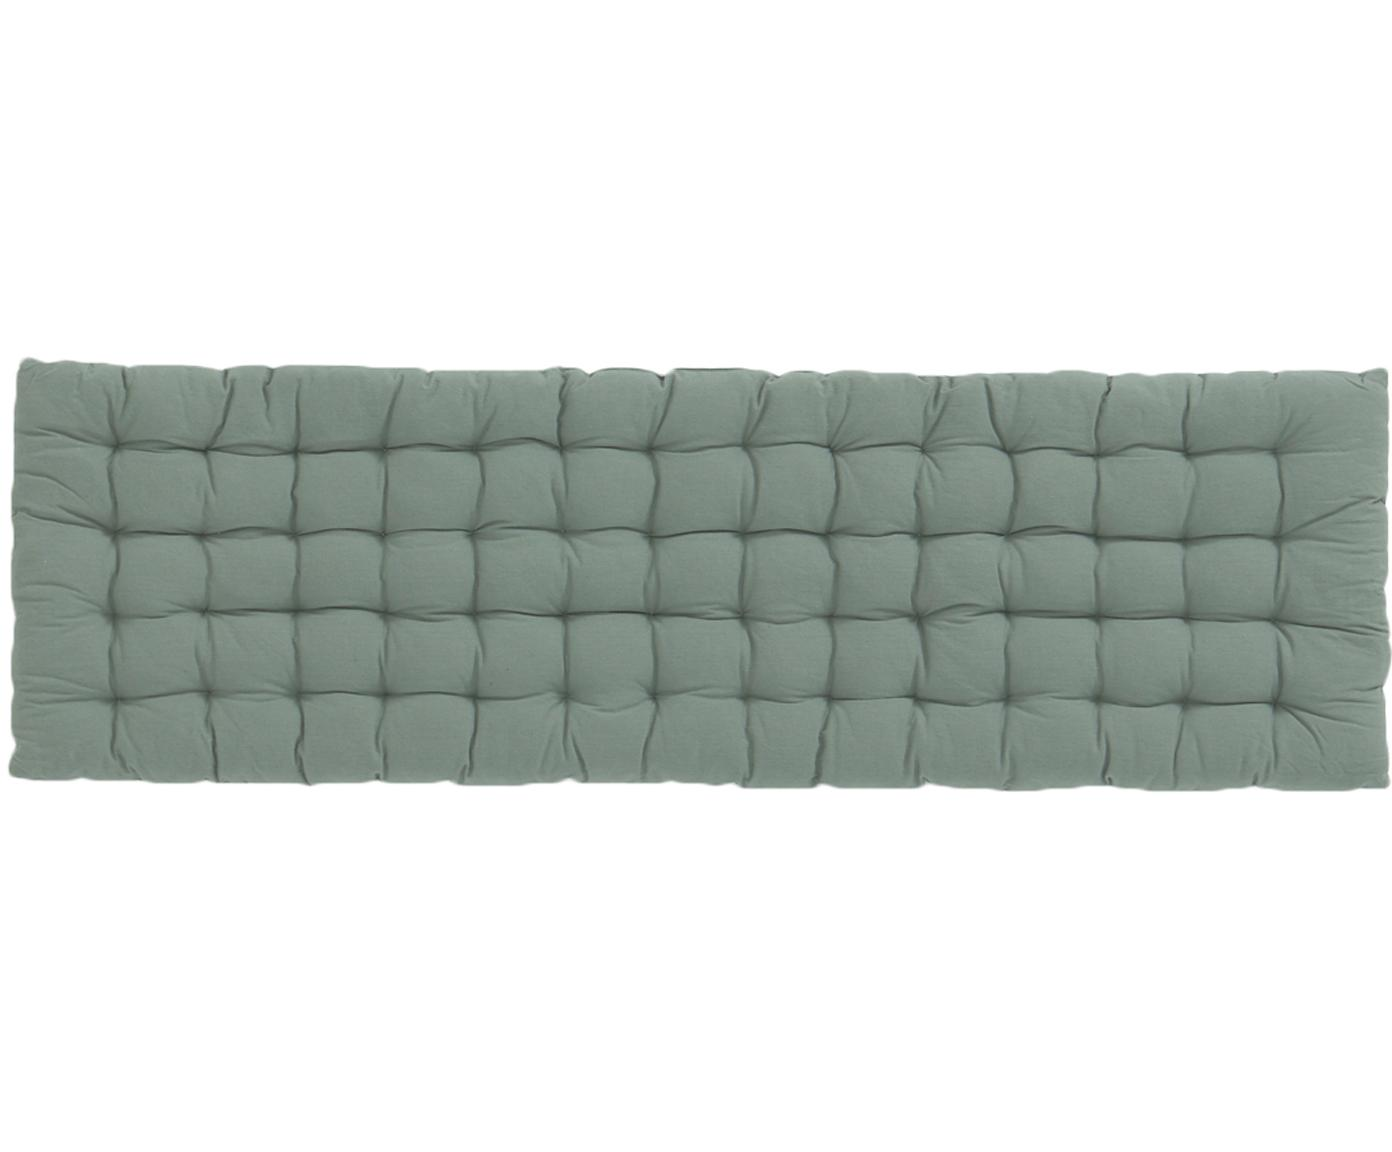 Nakładka na ławkę Gavema, Zielony, S 40 x D 120 cm